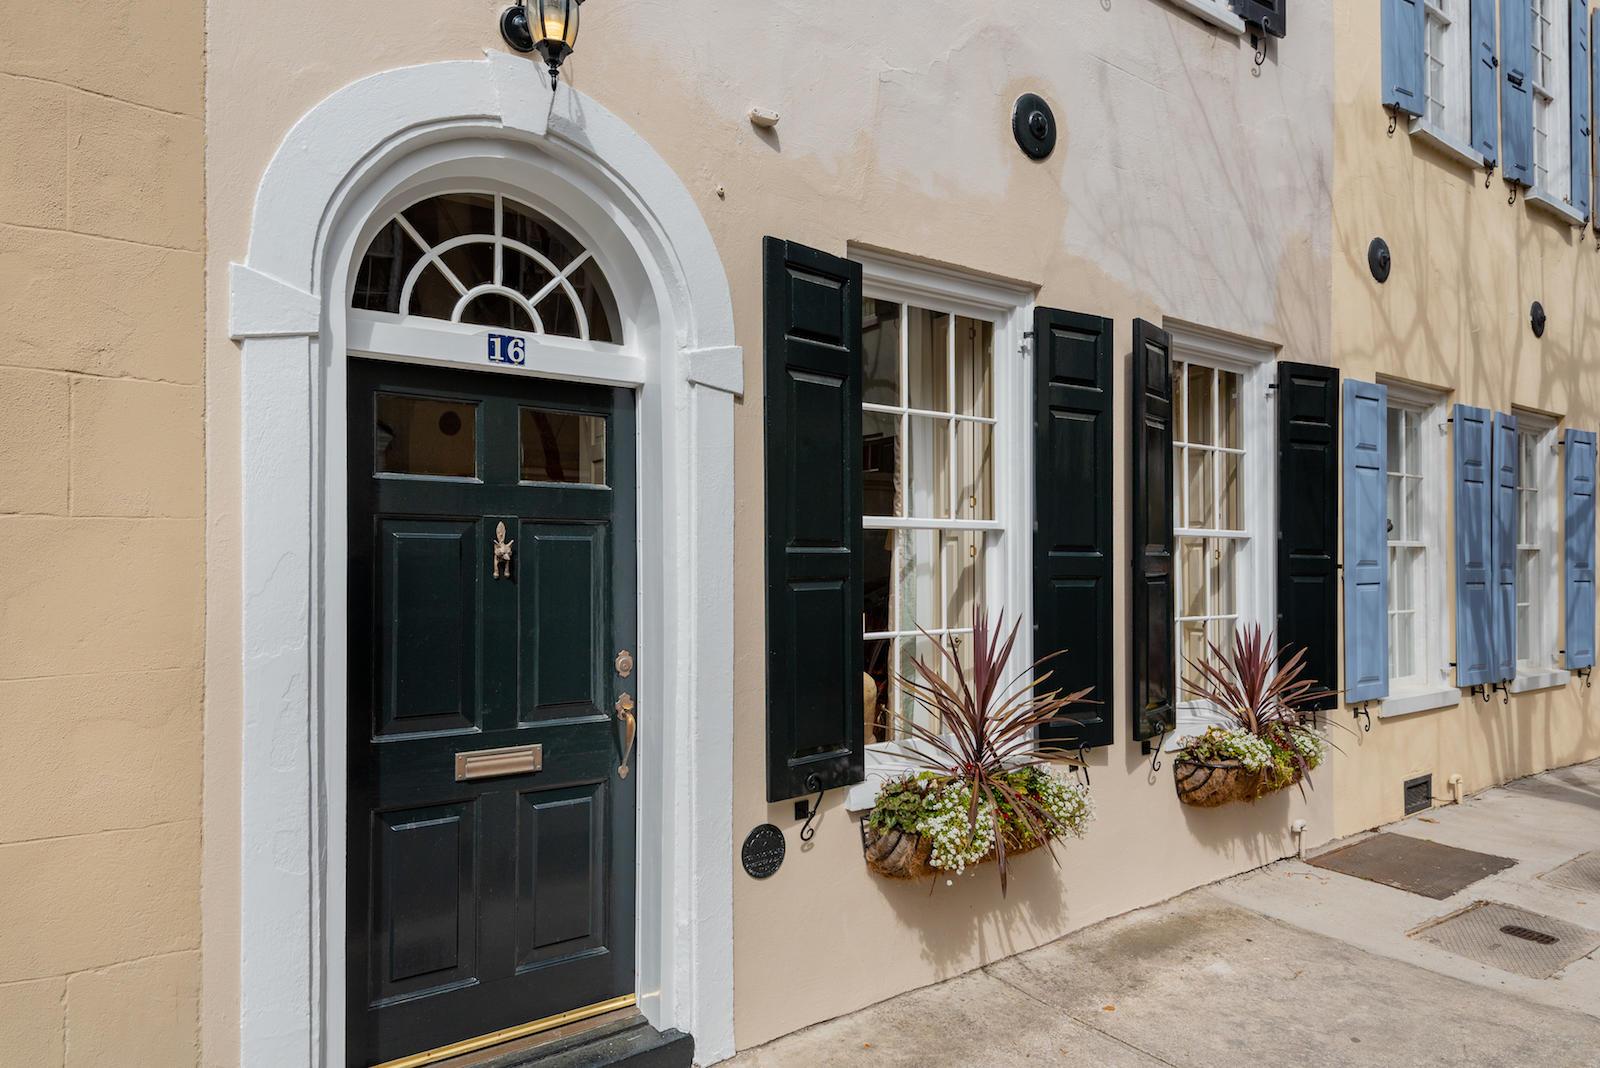 16 Tradd Street, Charleston, 29401, 3 Bedrooms Bedrooms, ,2 BathroomsBathrooms,Residential,For Sale,Tradd,21004198